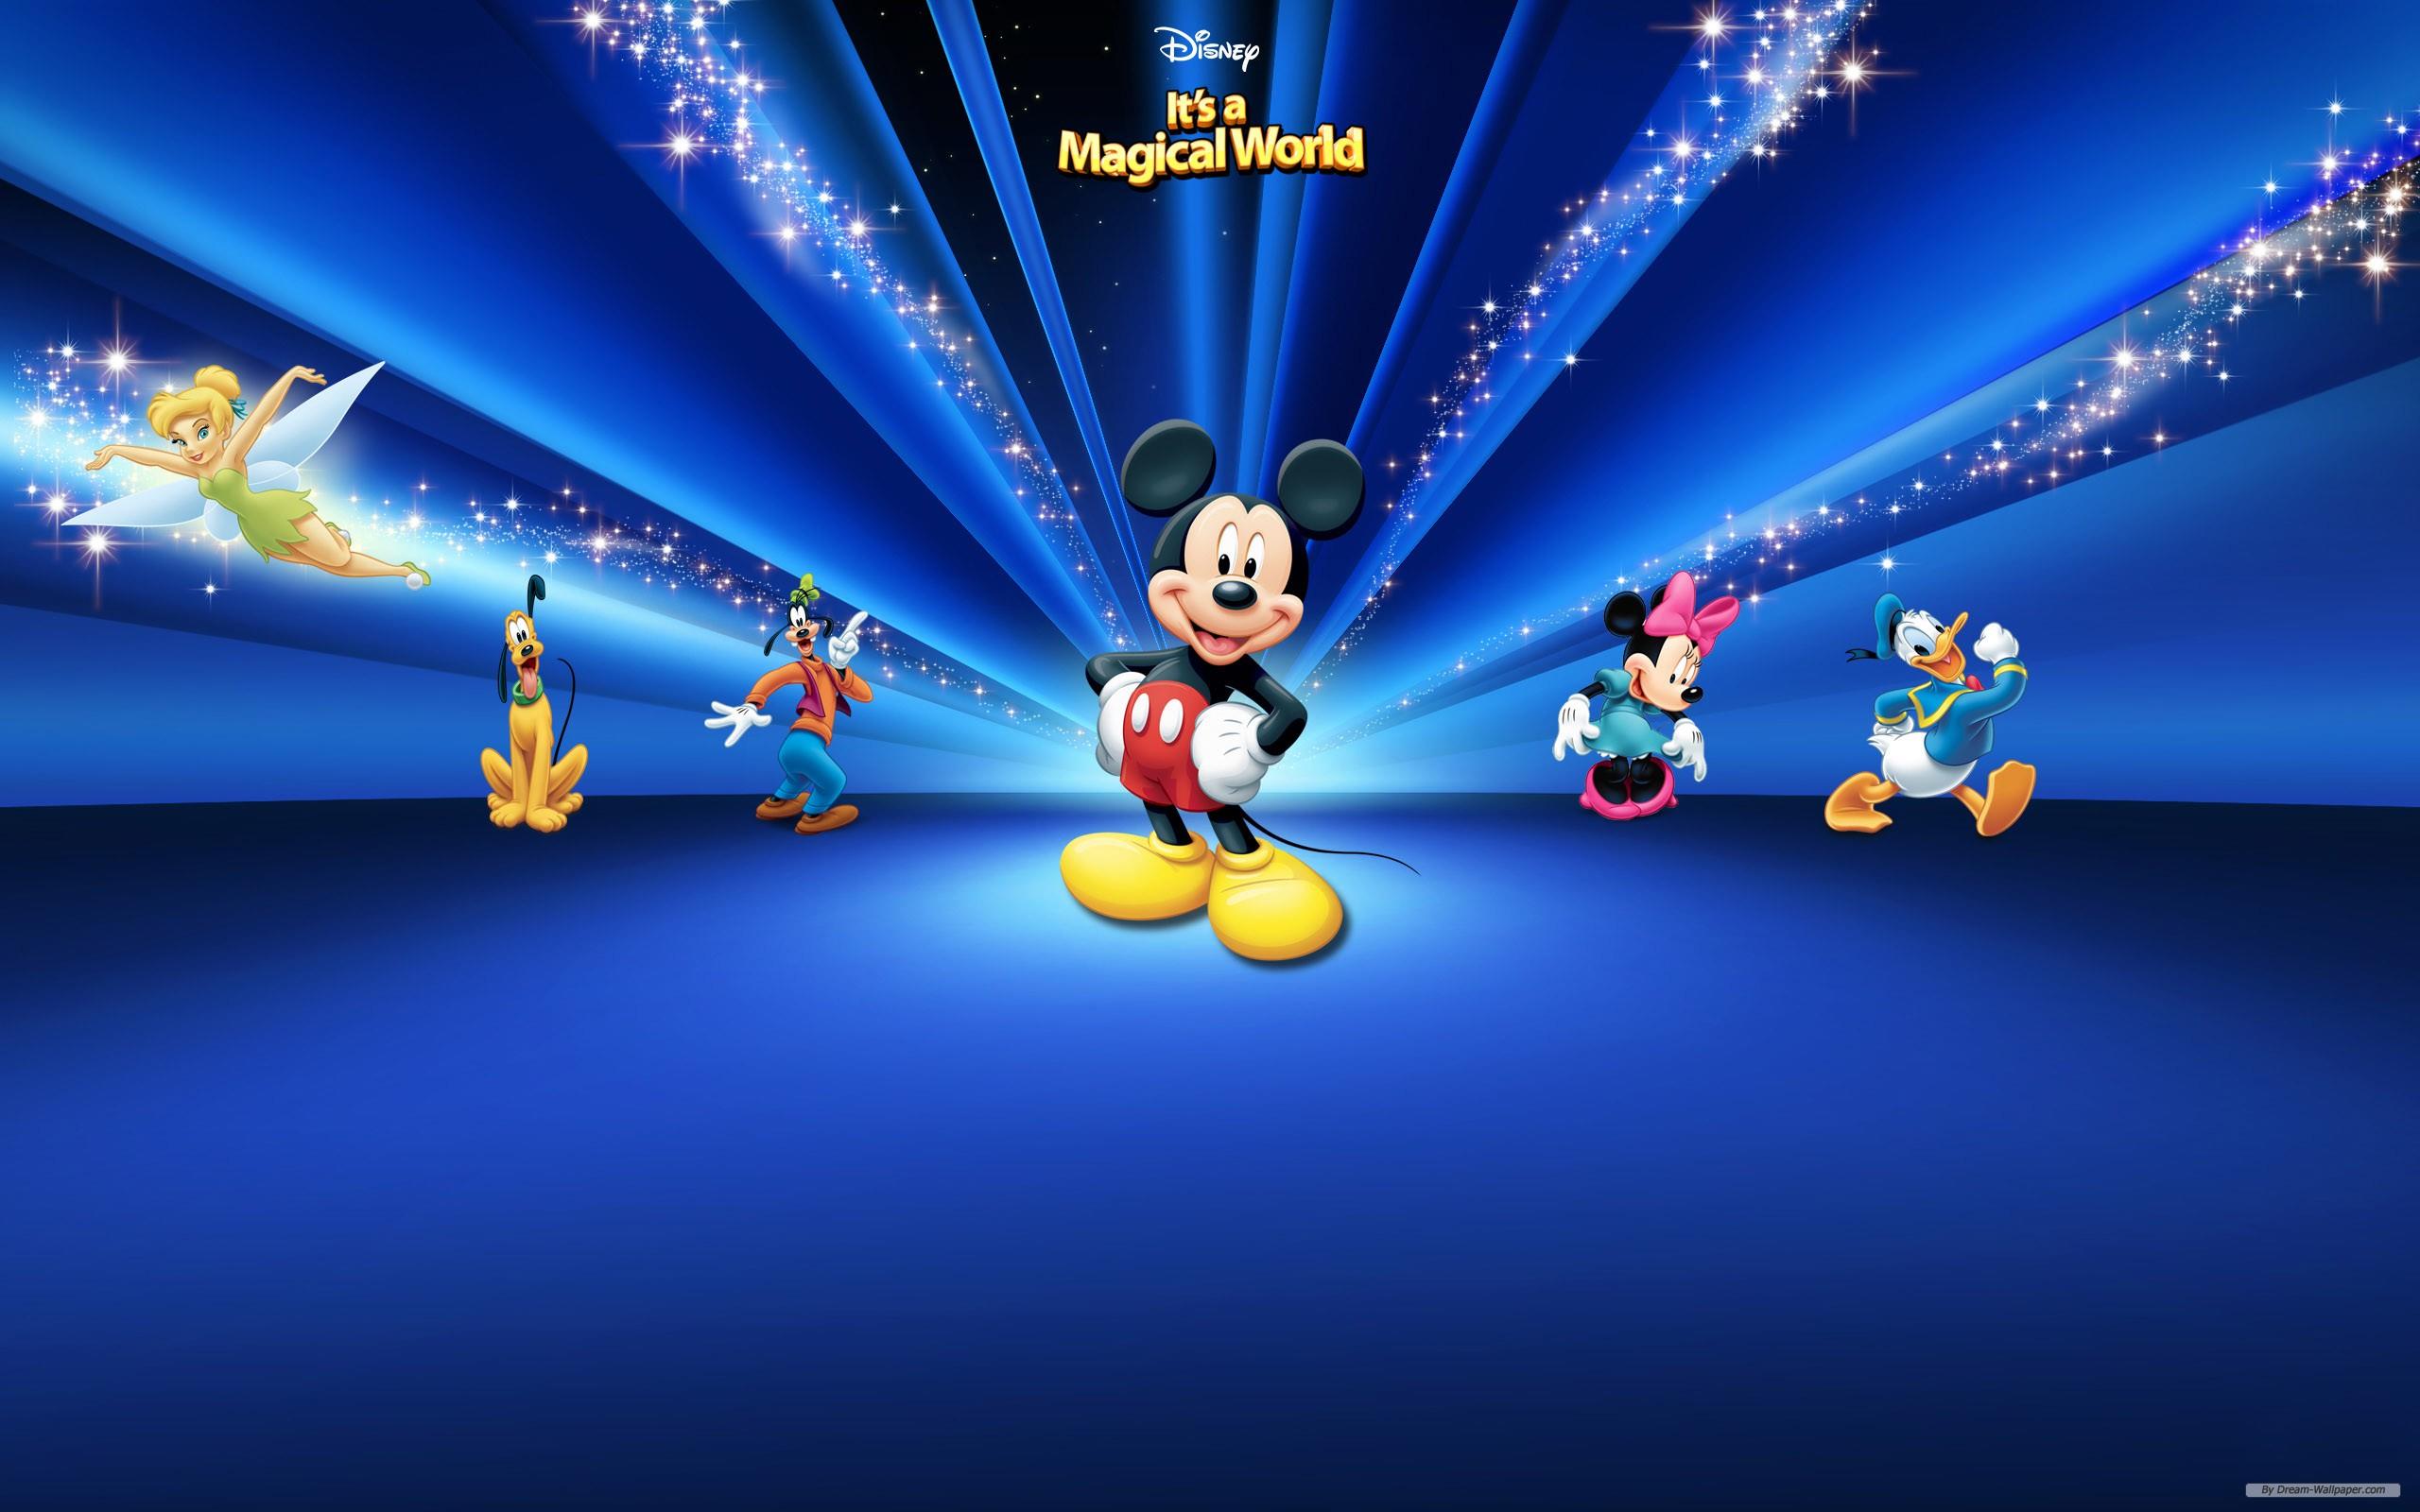 wallpaper   Disney Theme 1 wallpaper   2560x1600 wallpaper   Index 9 2560x1600